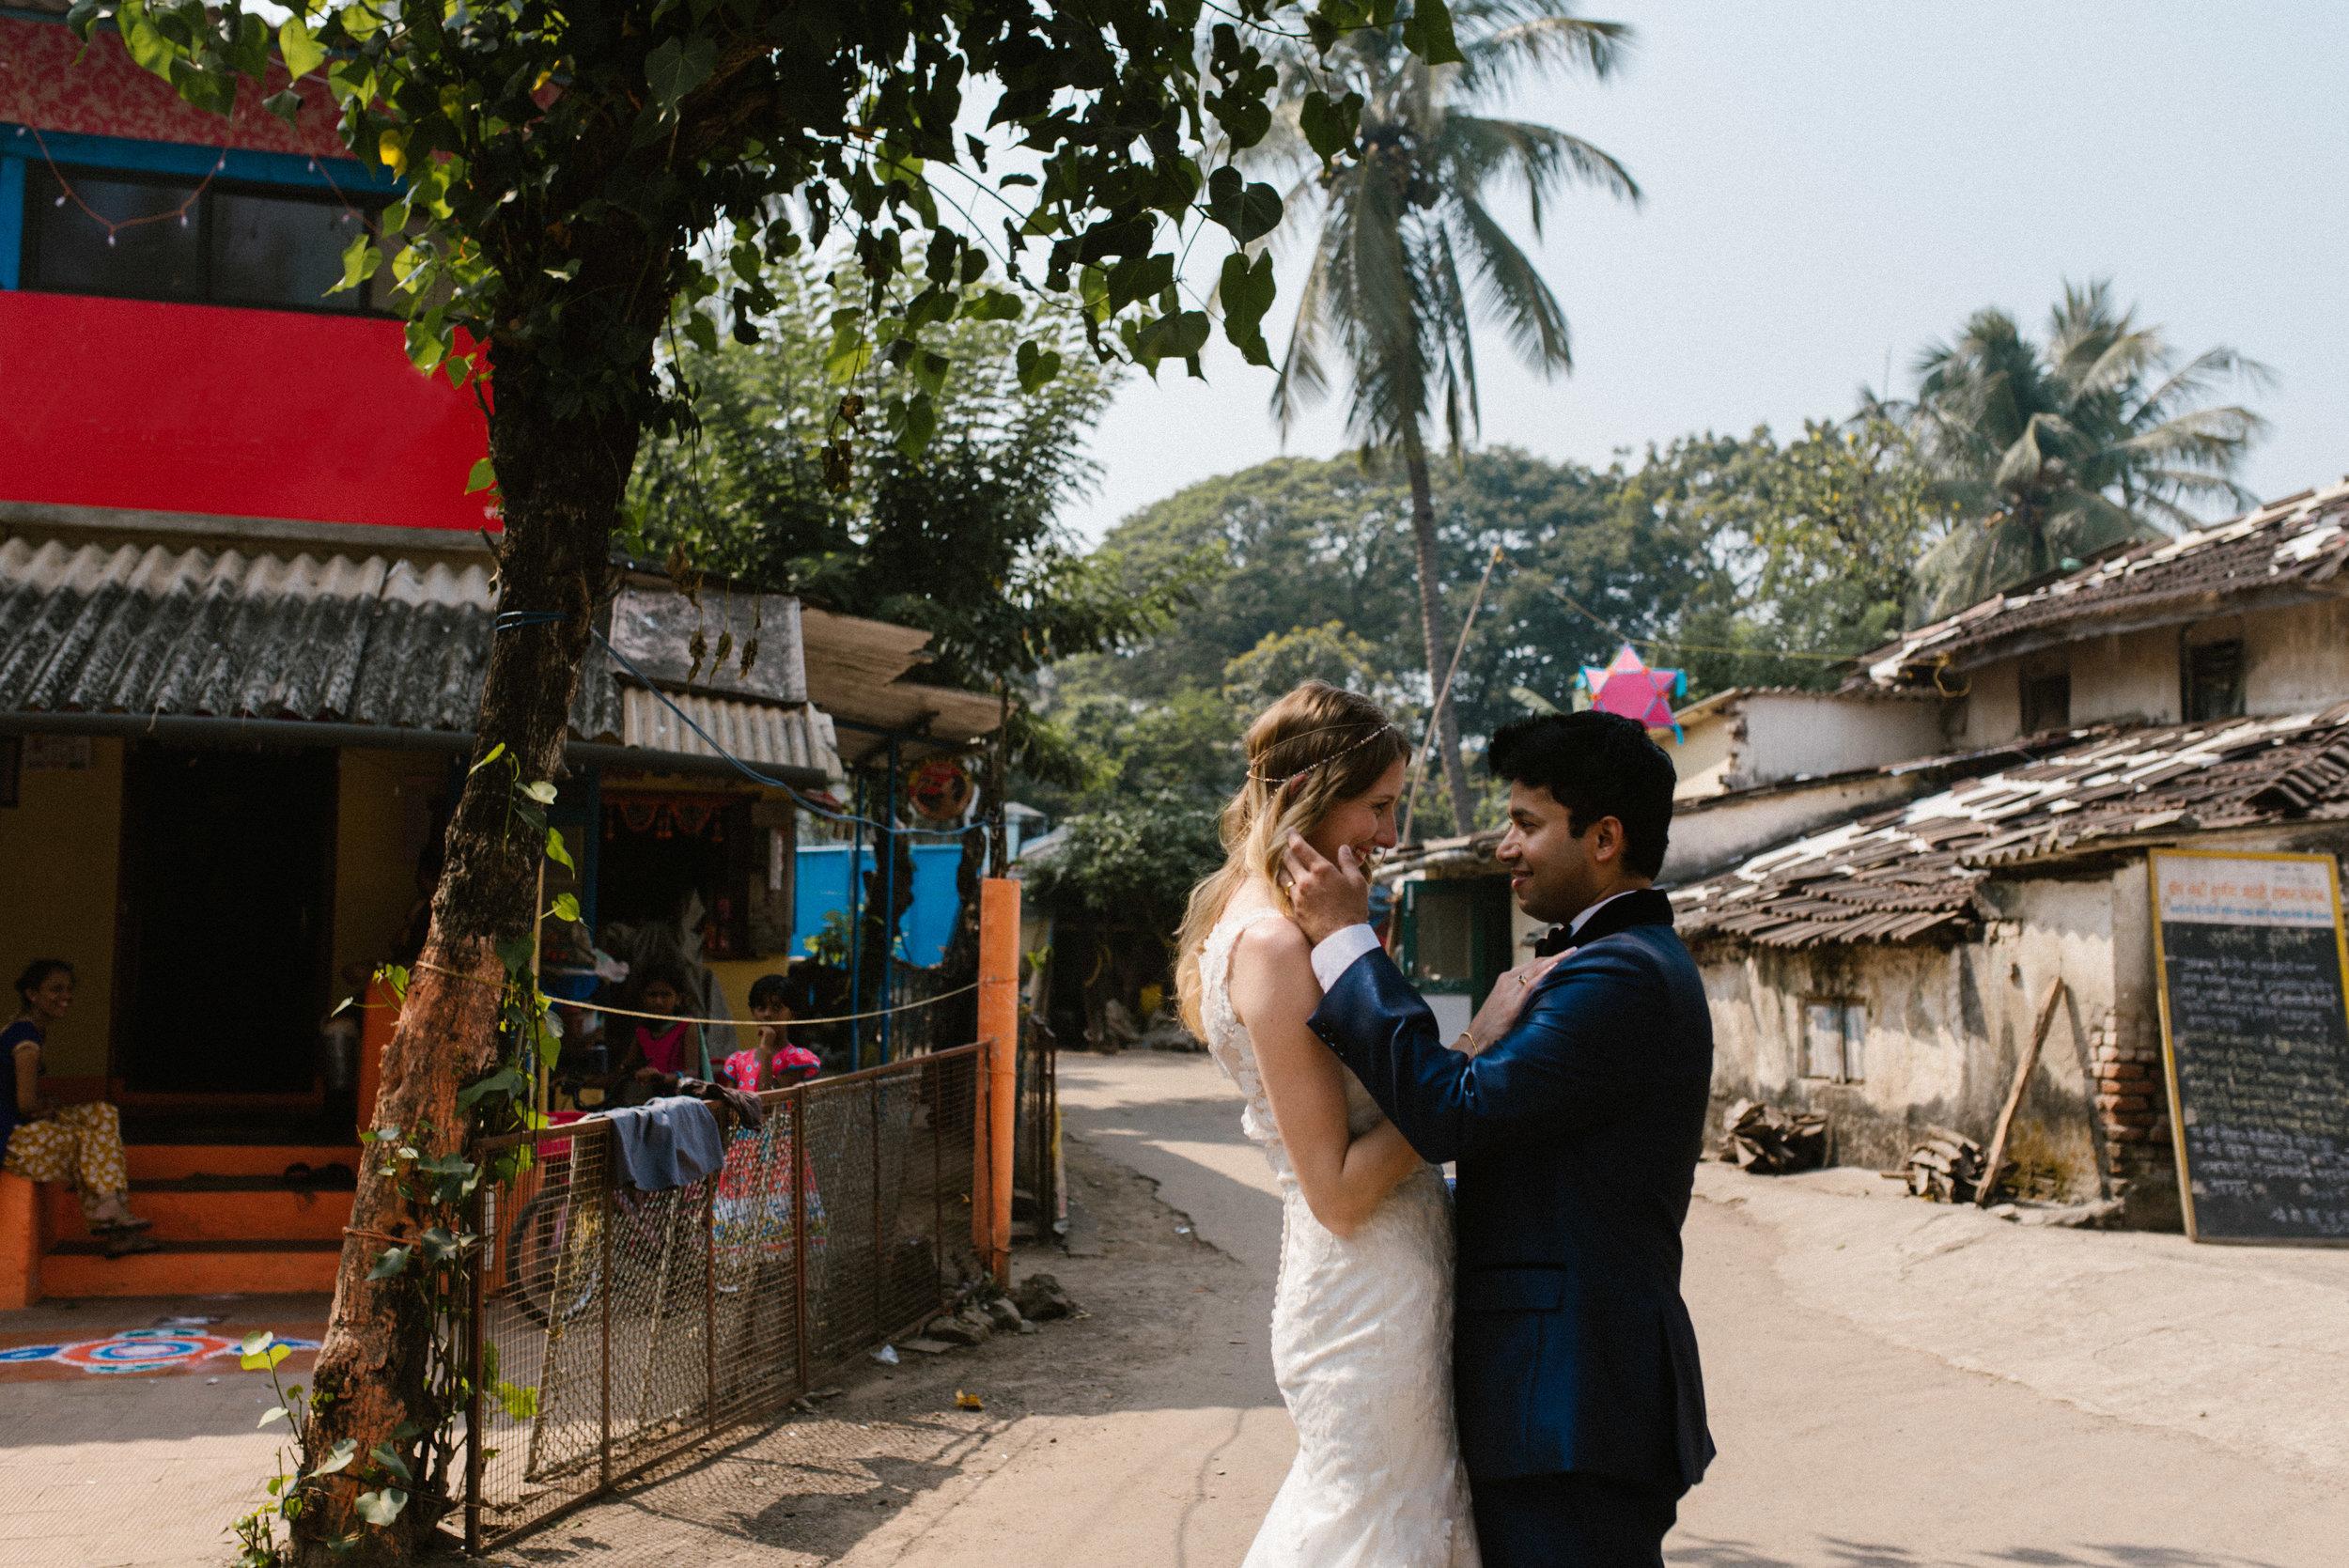 Destination wedding photographer Mumbai India